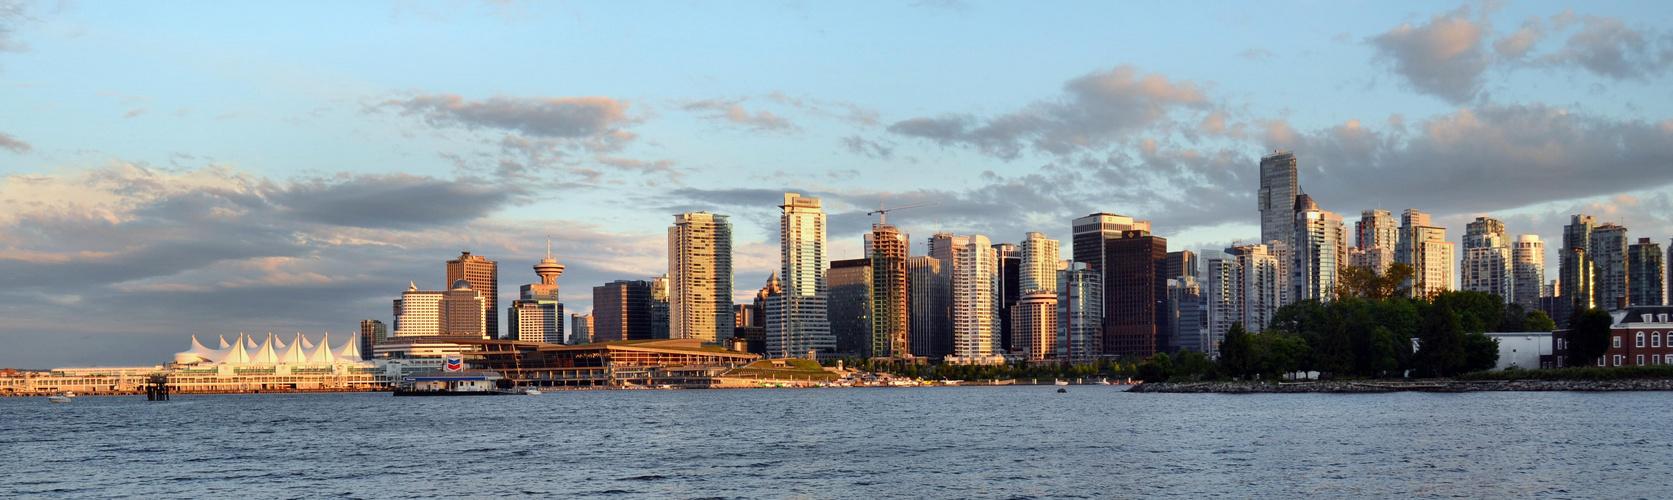 Vancouver Skyline_Juni2011